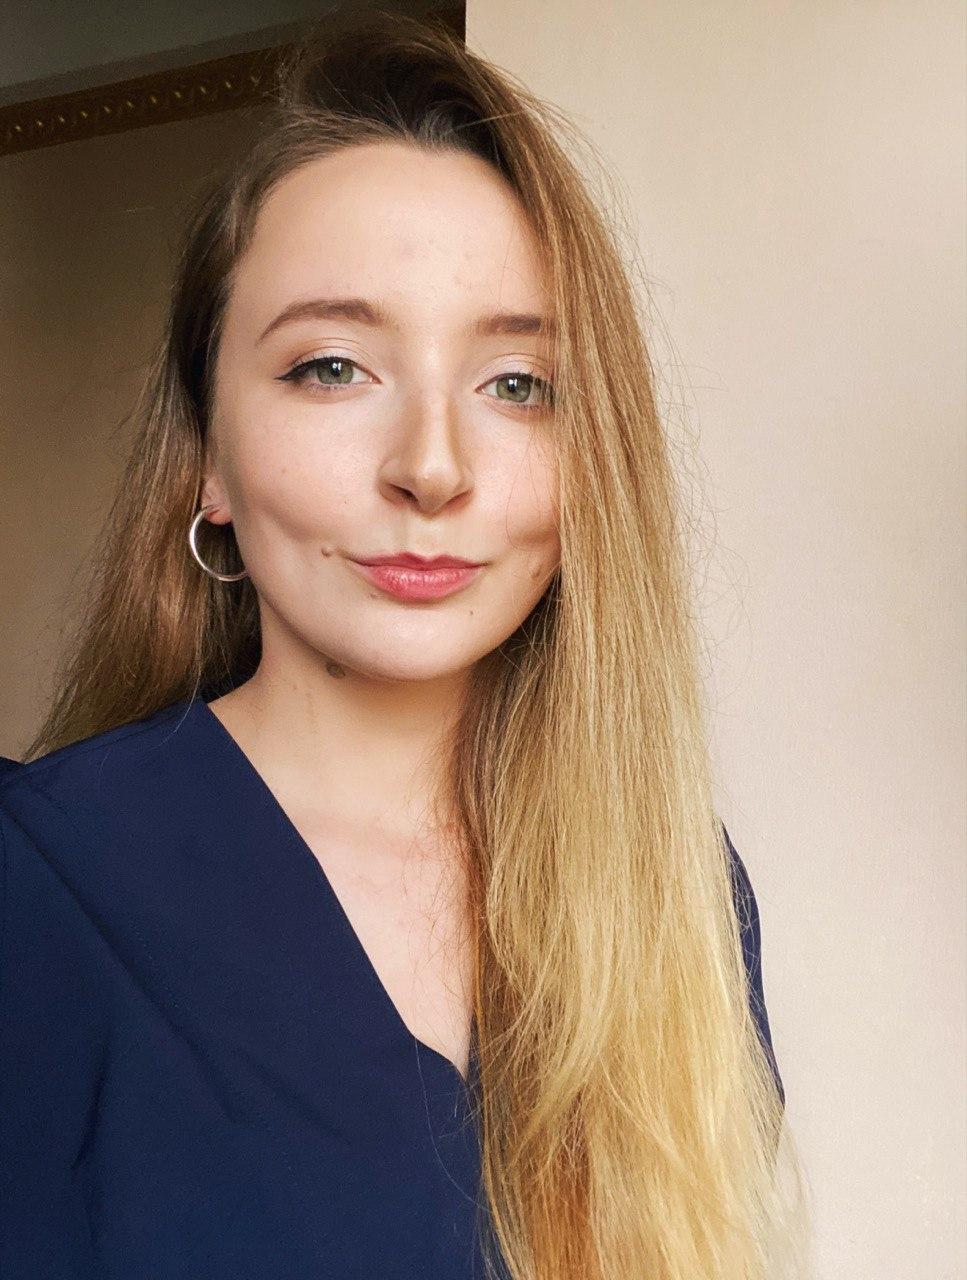 Olha Polishchuk